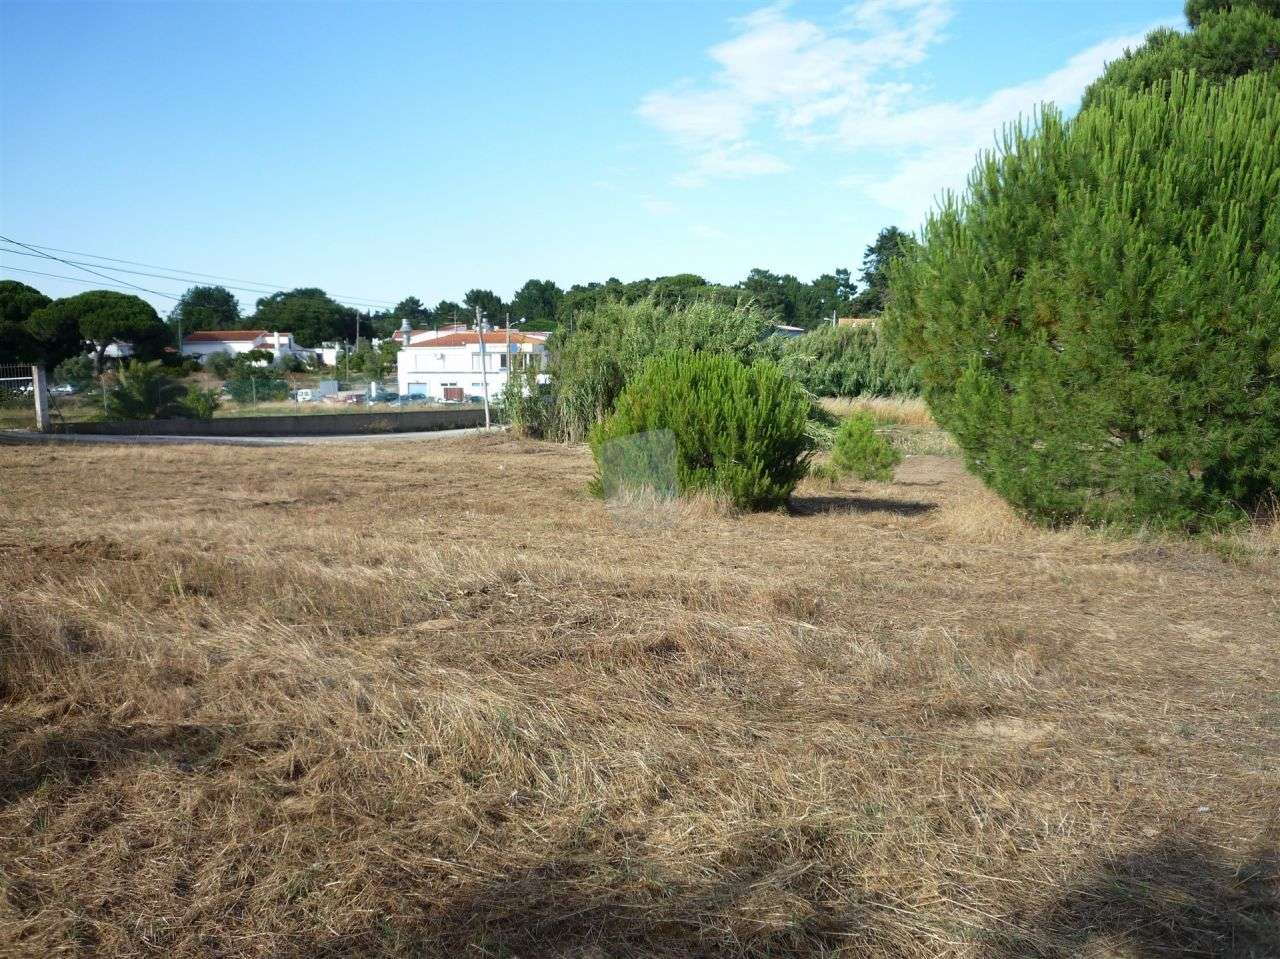 Terreno para comprar, Castelo (Sesimbra), Setúbal - Foto 10